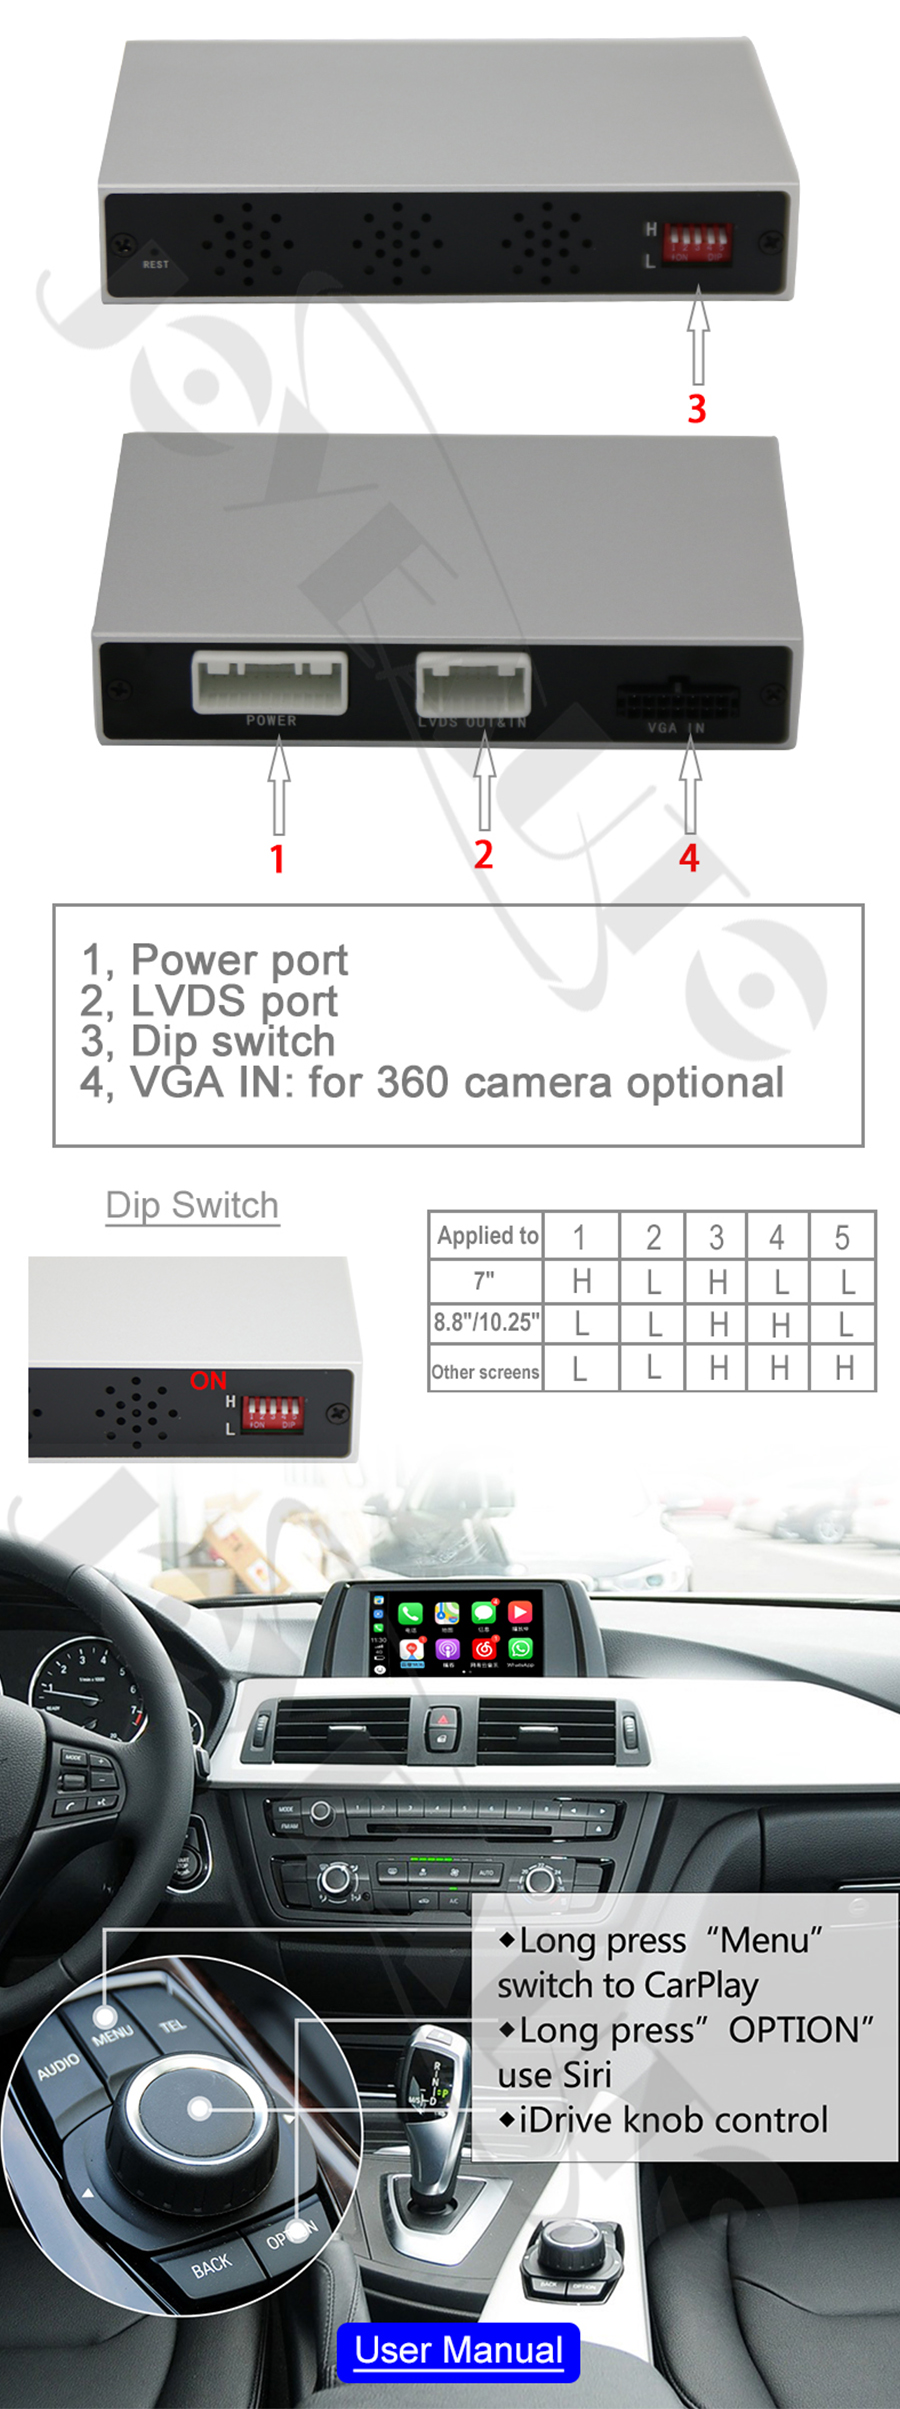 Aftermarket Full Apple Carplay Screen X1 F48 NBT 2013-2017 MY Android Auto  Solution Retrofit Reversing Camera